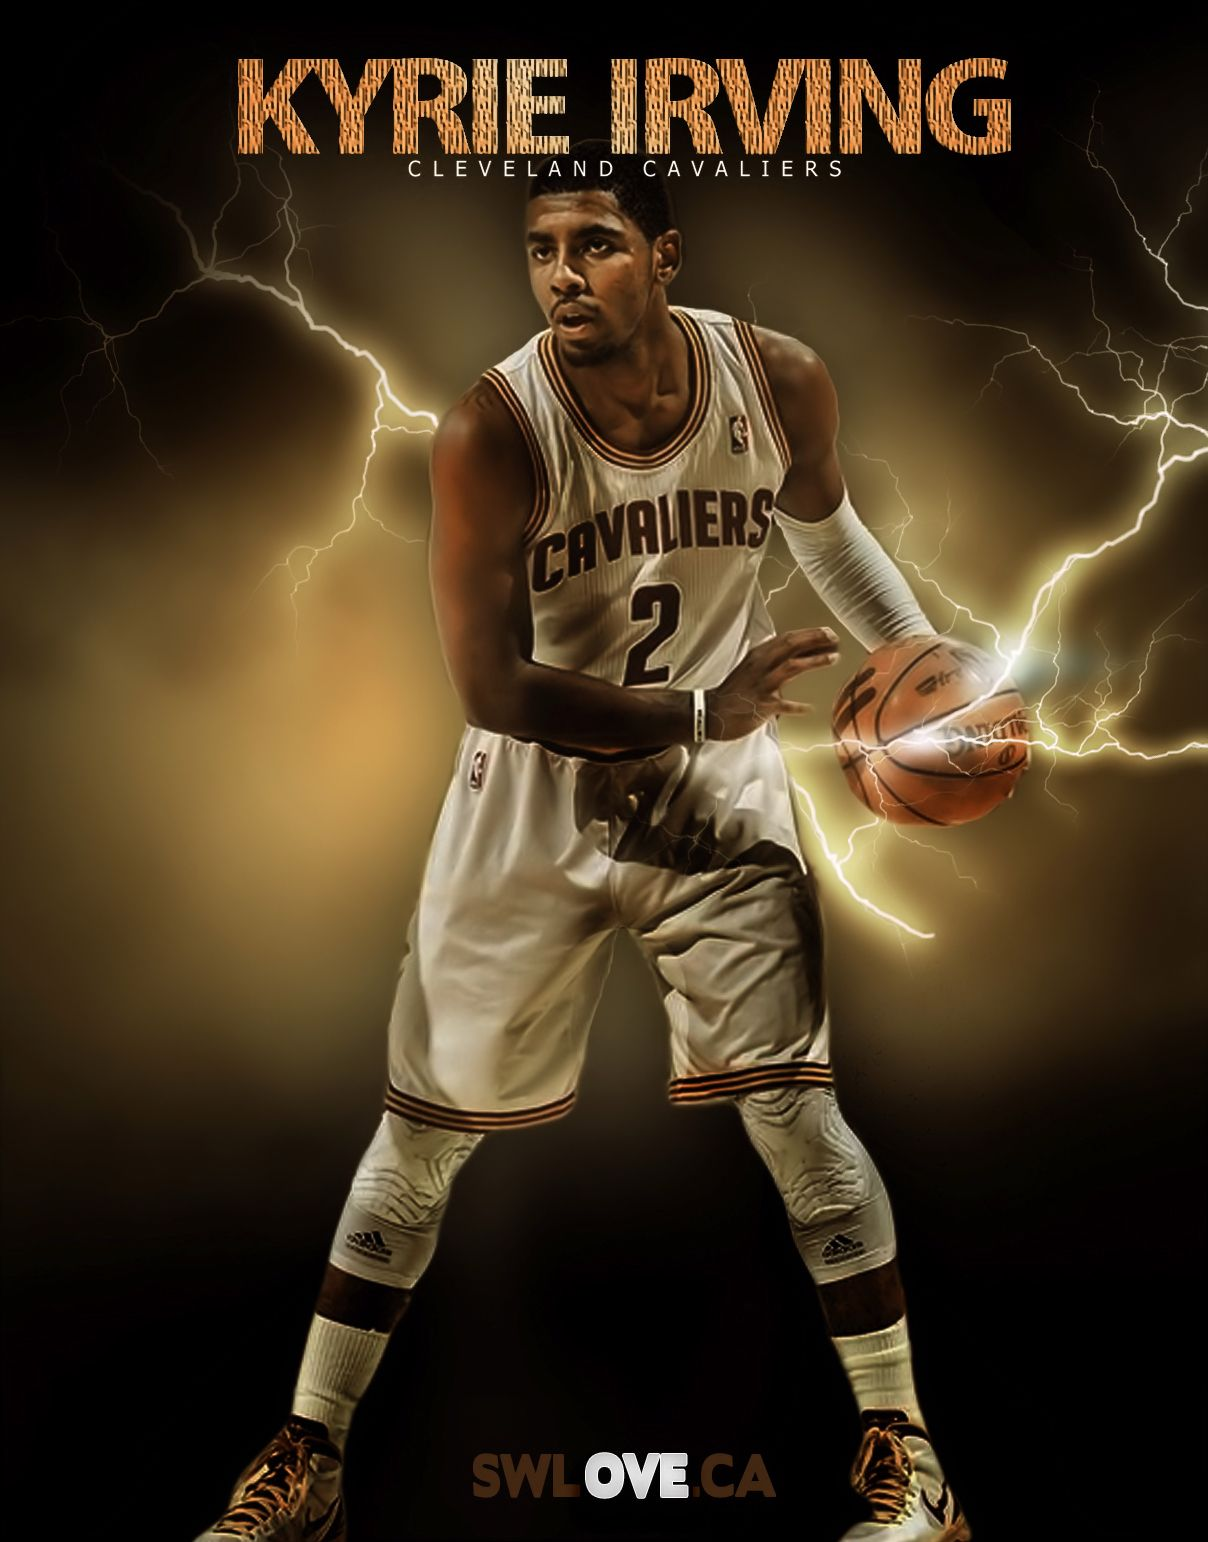 LeBron James 6 Cavs Jersey LeBron James Cleveland